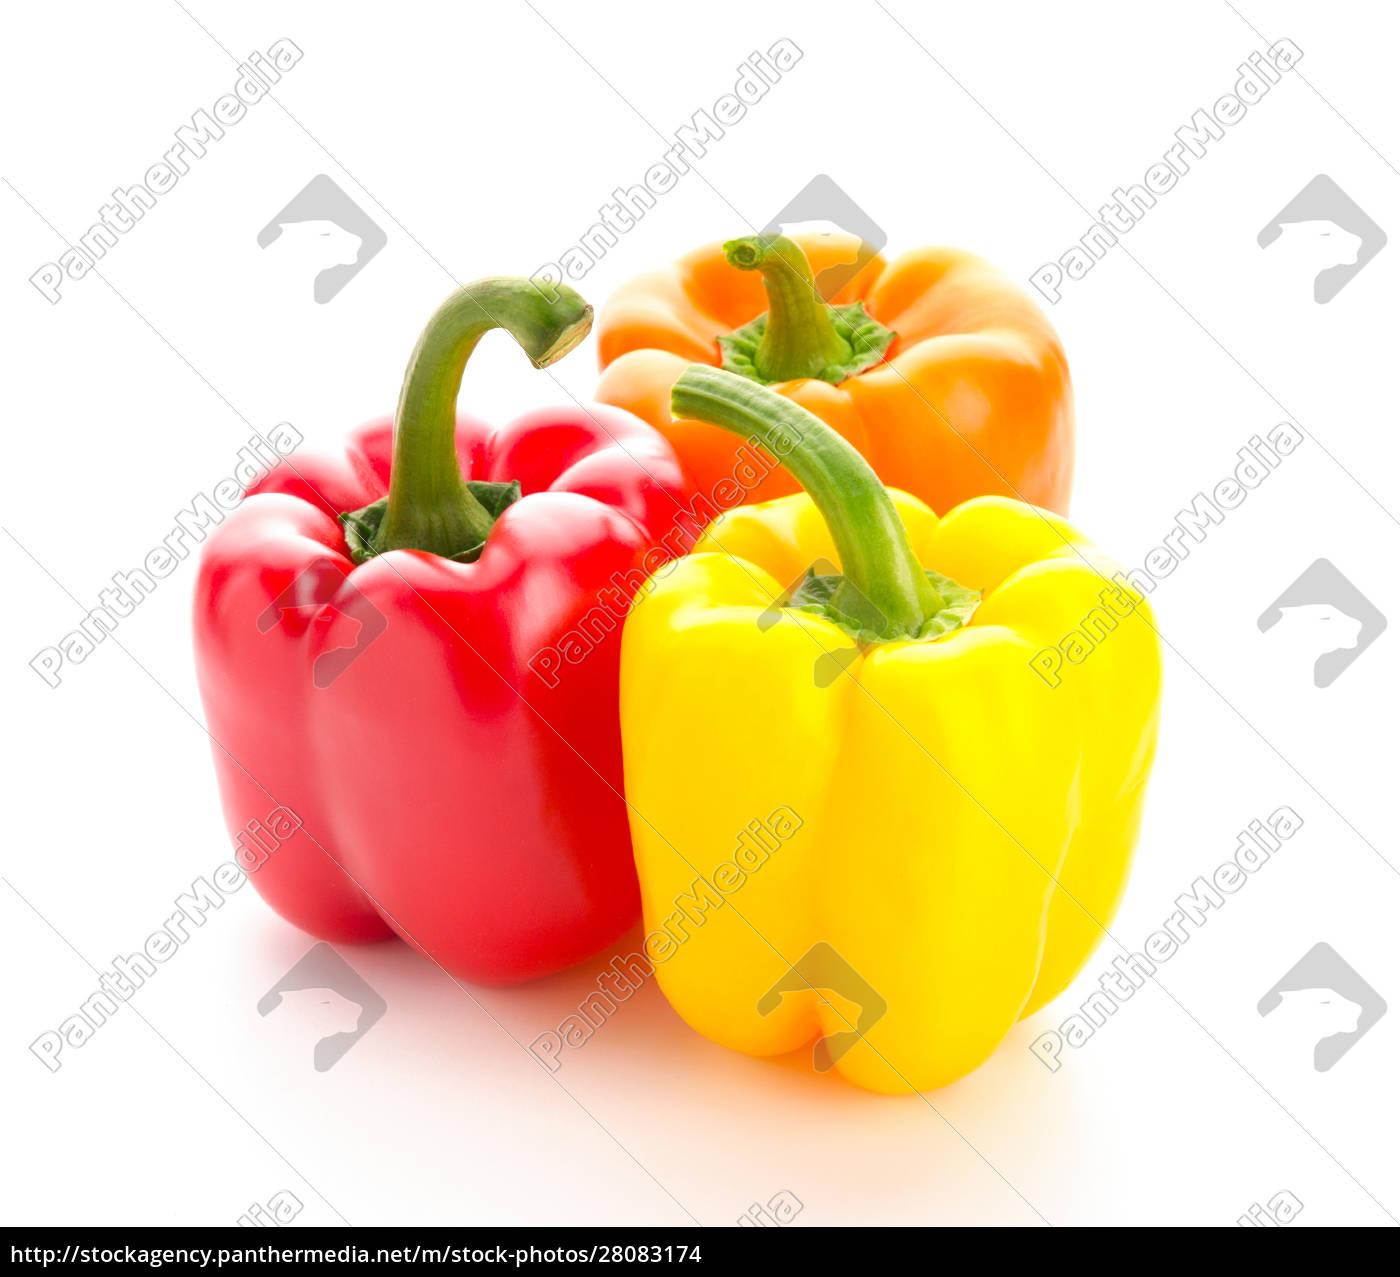 pepper - 28083174